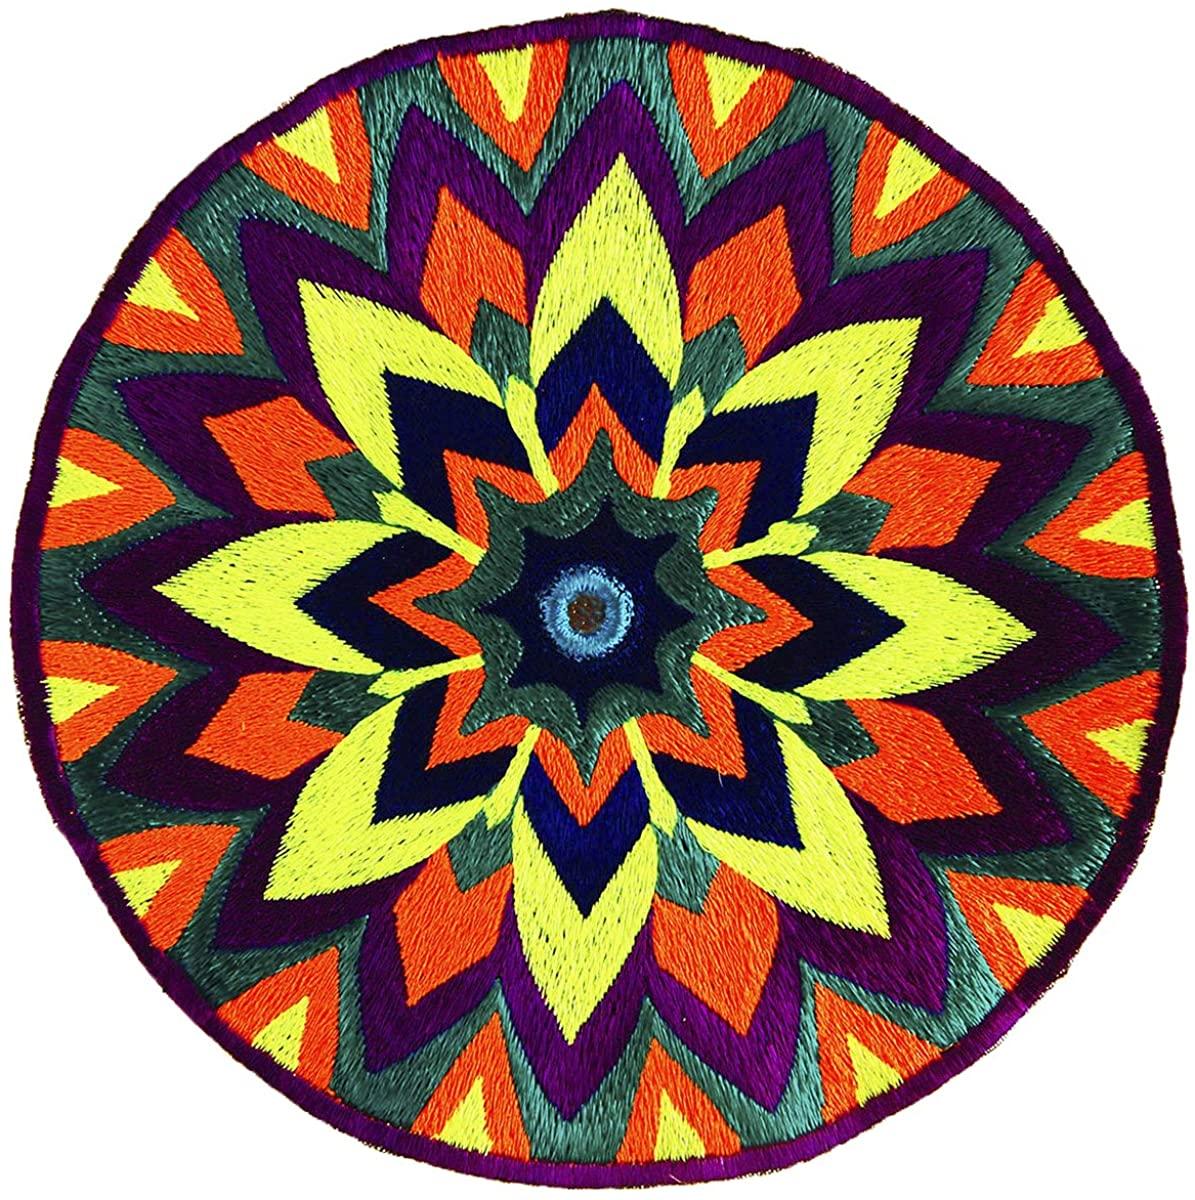 ImZauberwald Mirror Mandala patch ~7 inch handmade embroidery art